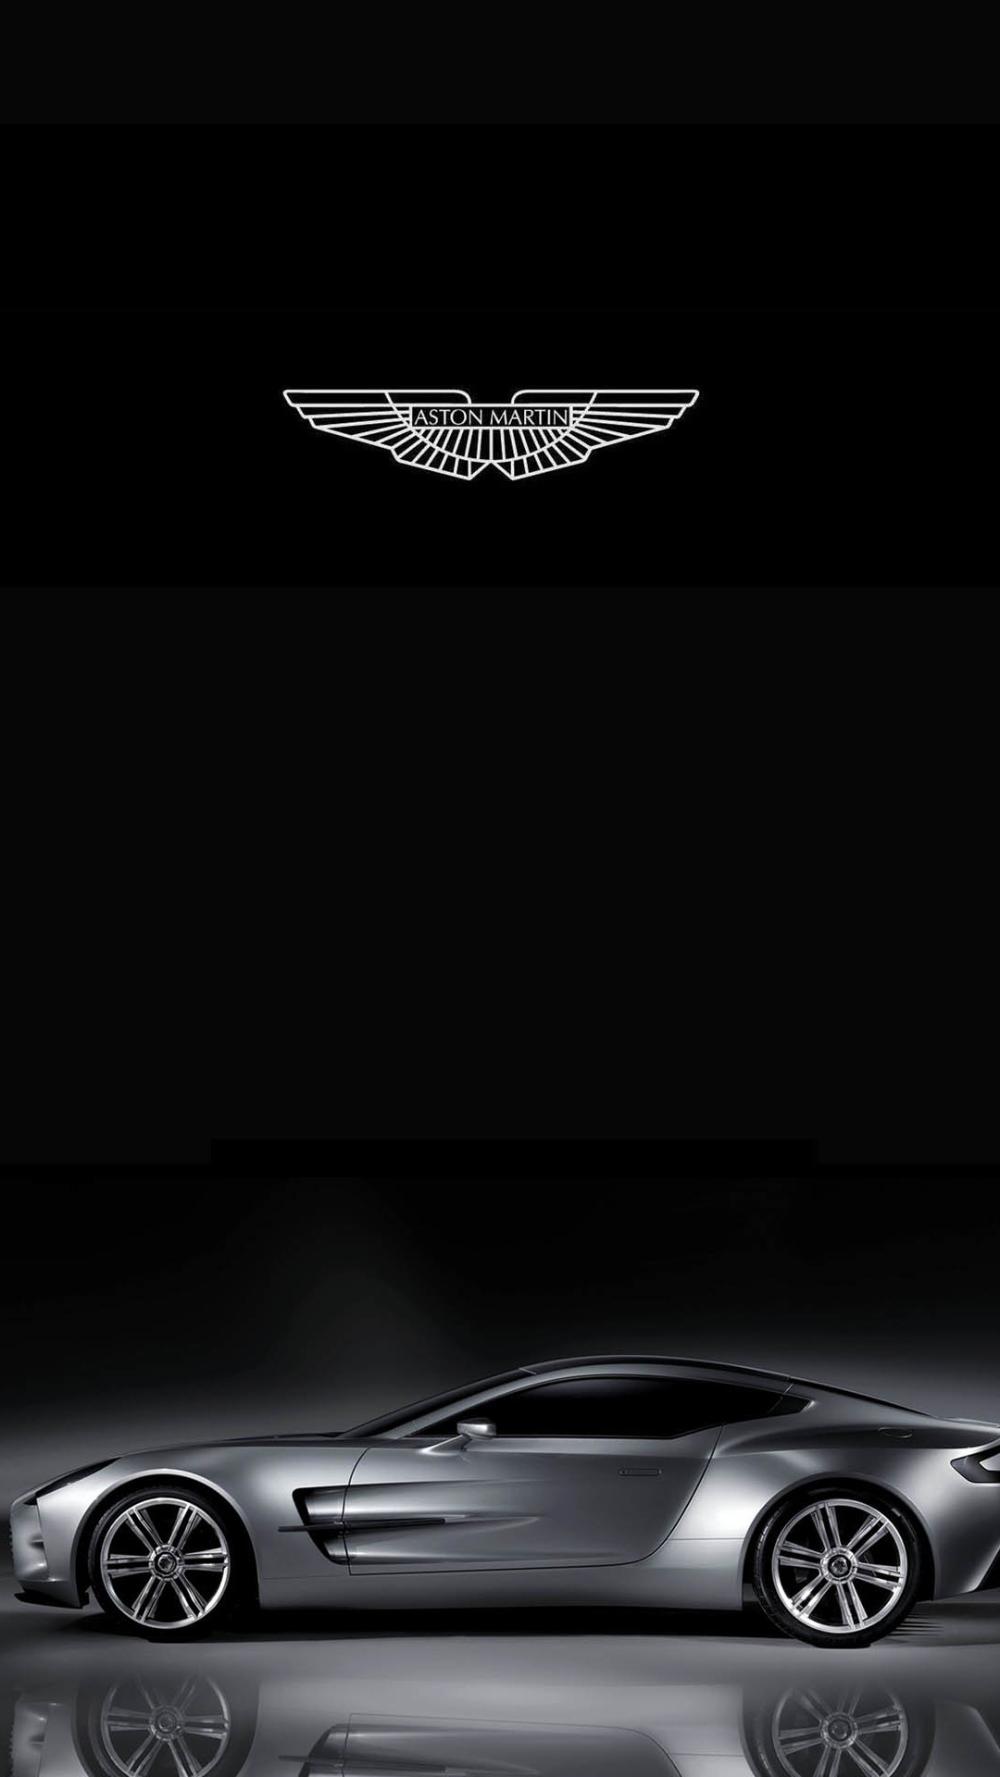 Aston Martin Vulcan Logo At Duckduckgo обои обои для телефона